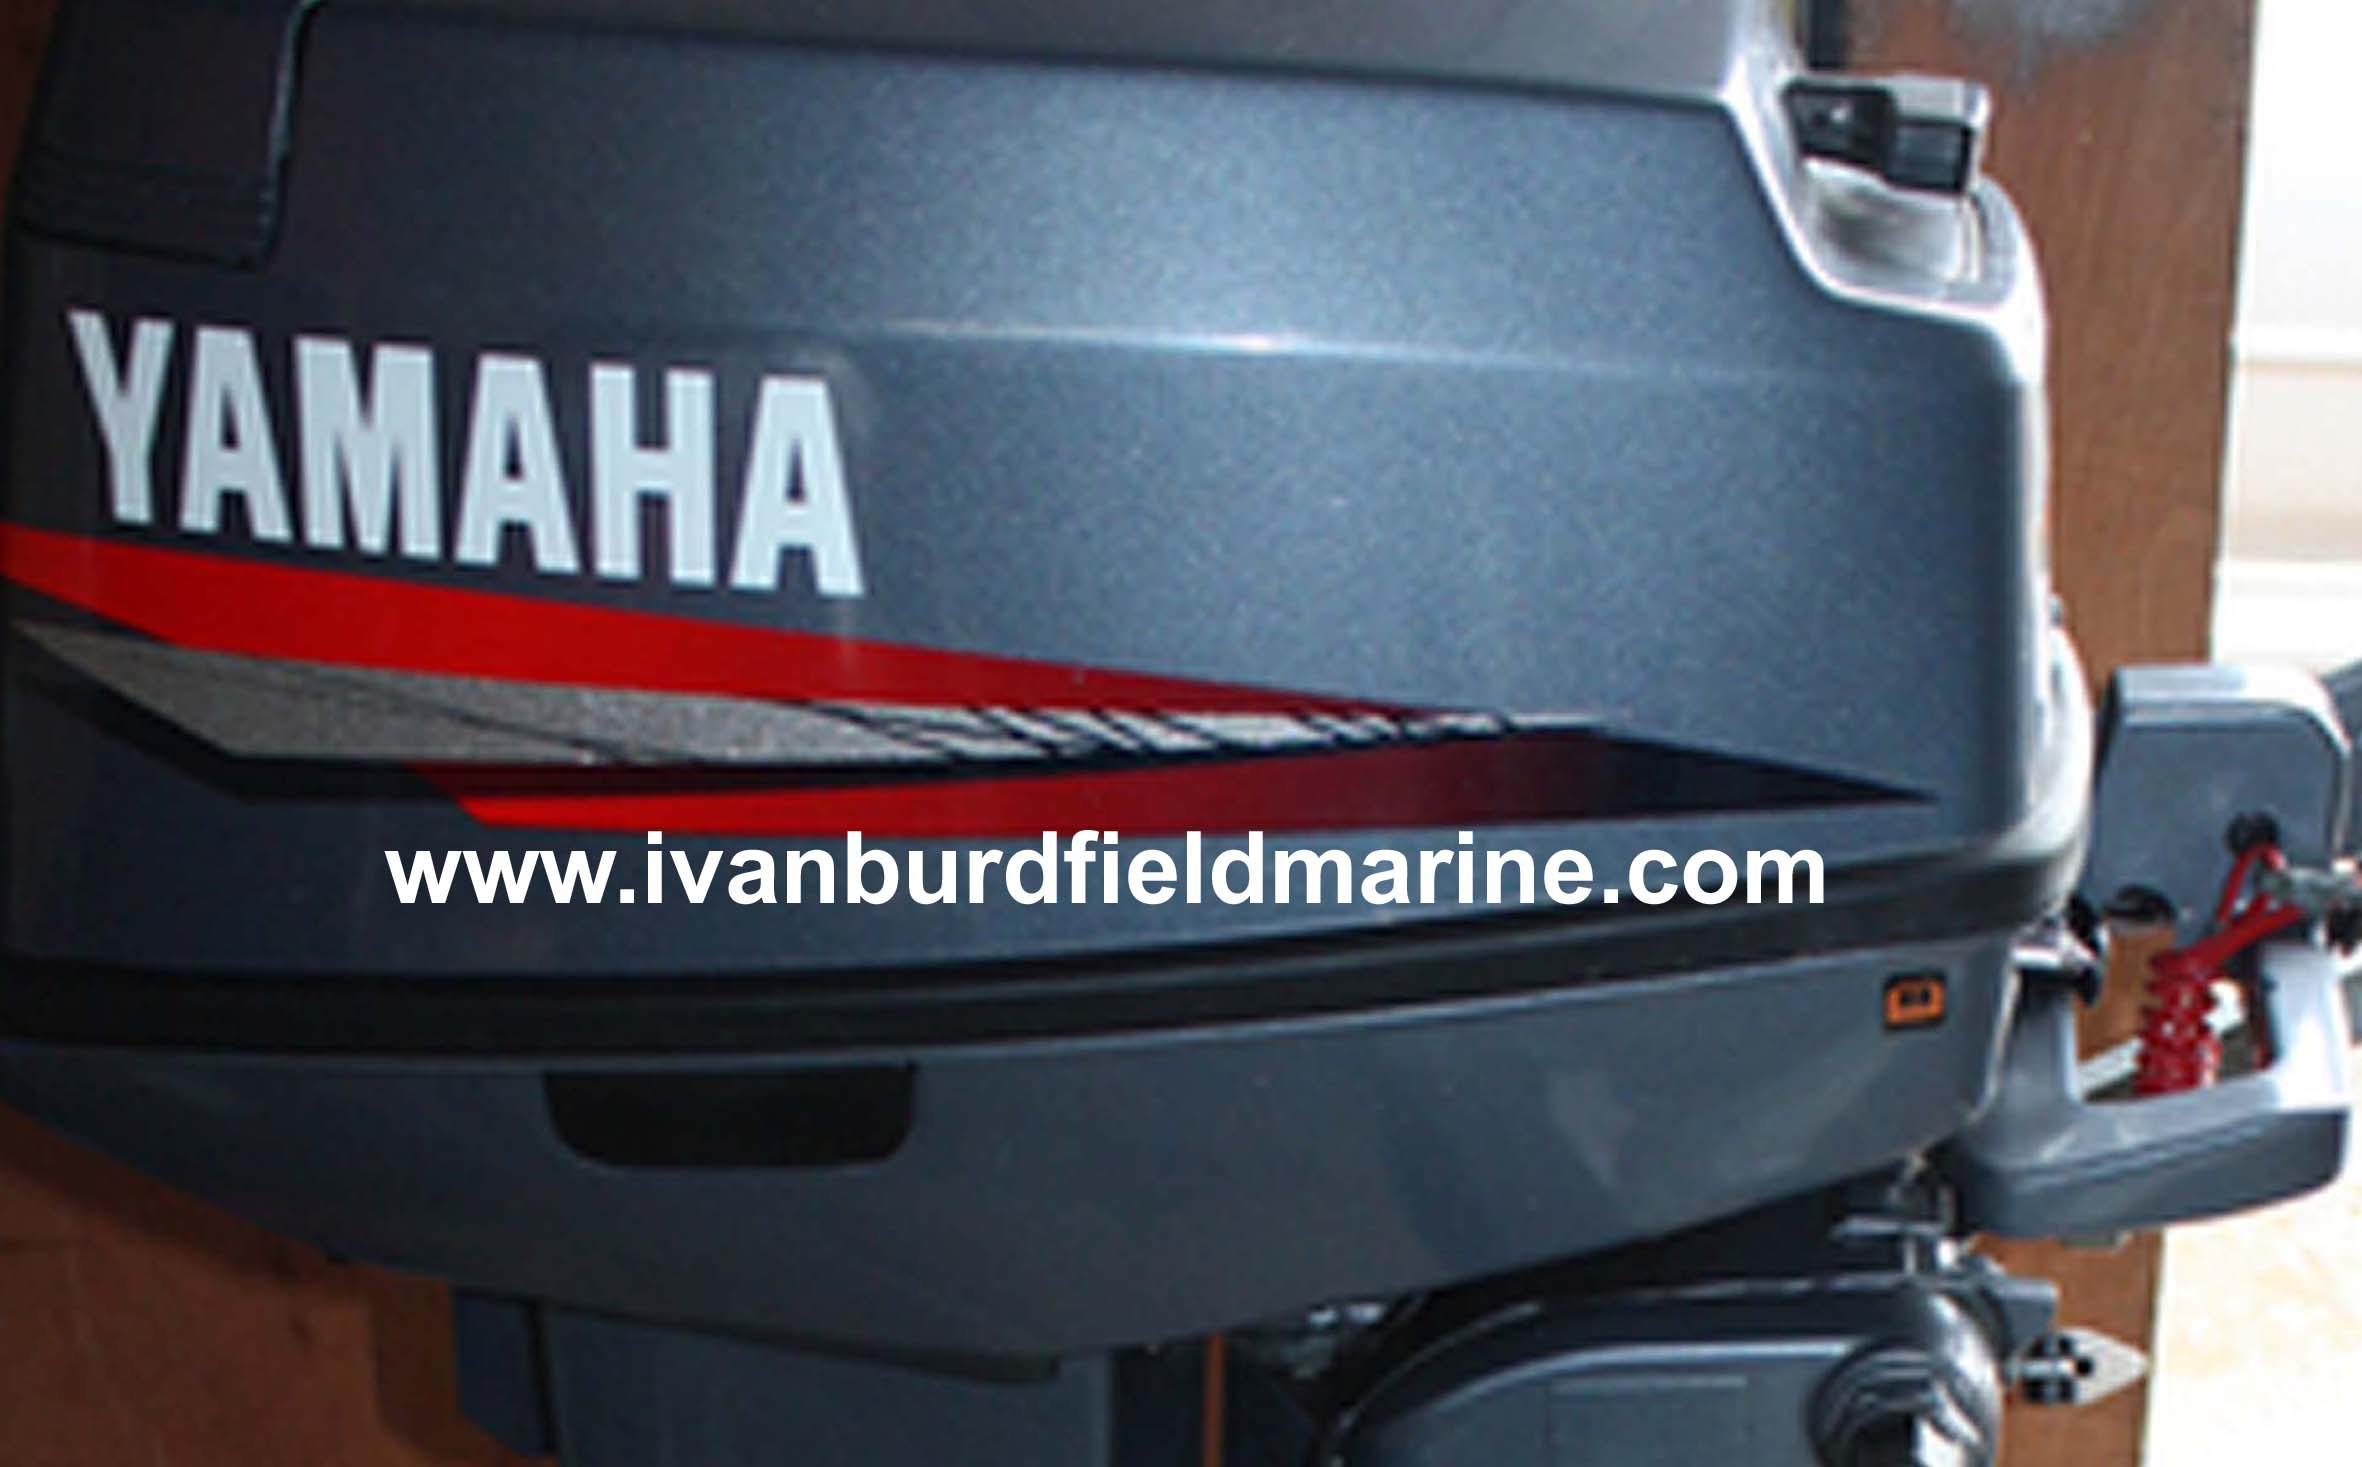 Yamaha 20hp 2 stroke